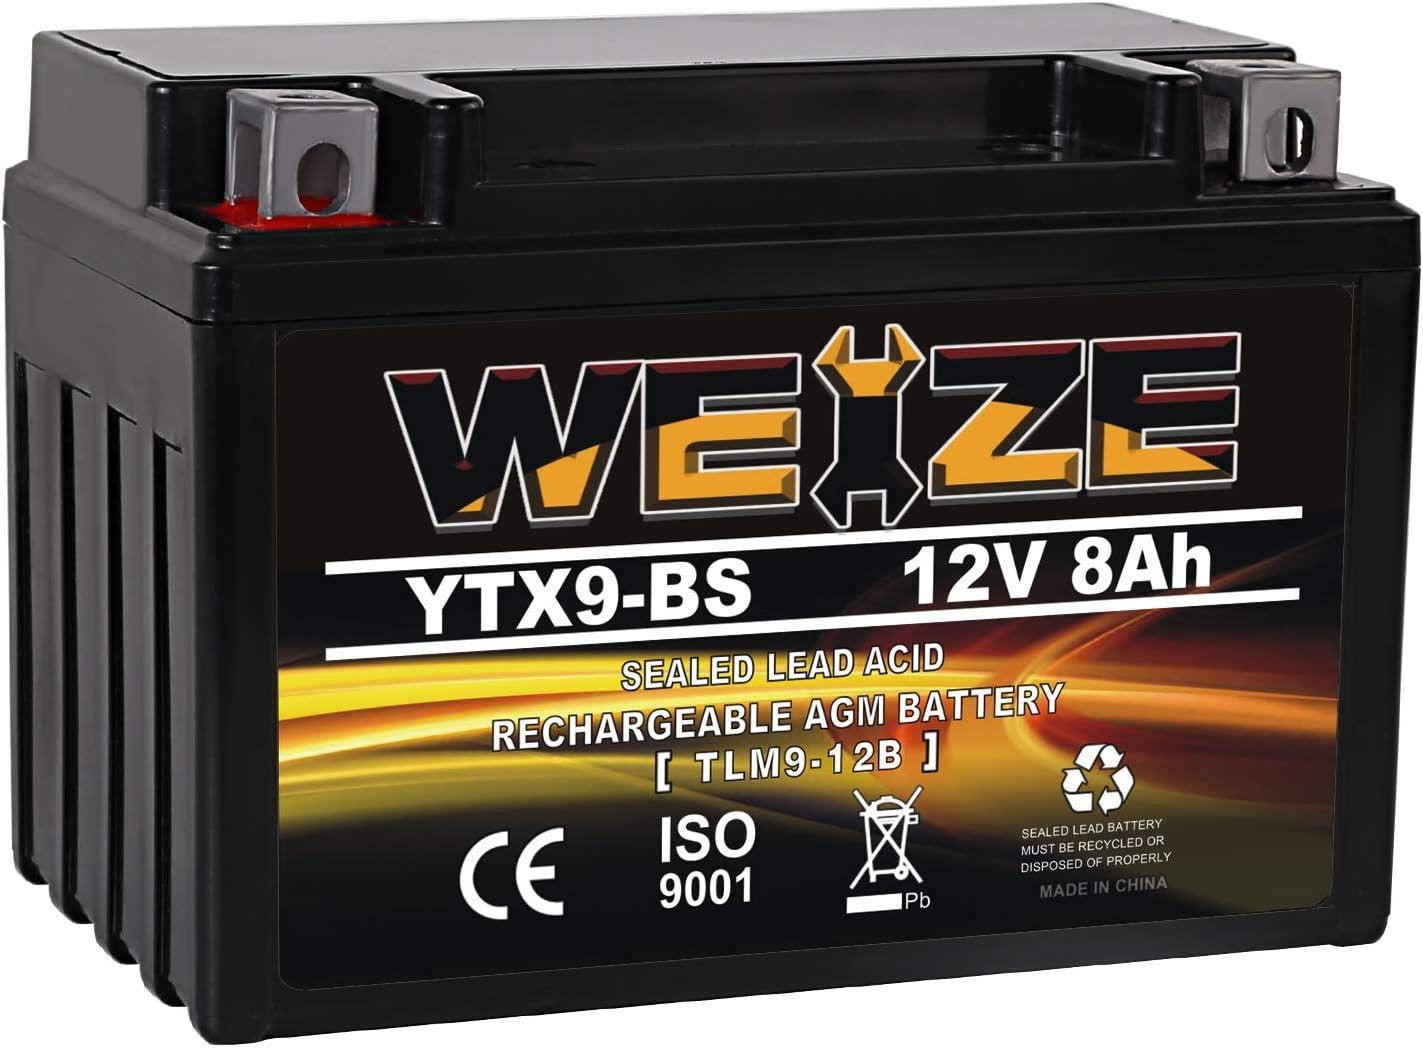 YTX9-BS Battery Maintenance Free For Motorcycle ATV Compatible with Honda TRX 400EX Sportrax Fourtrax GSXR600 LTZ250 ZX600, Polaris Predator 500,Suzuki GSX-R600 YTX9 ETX9 BS Batteries